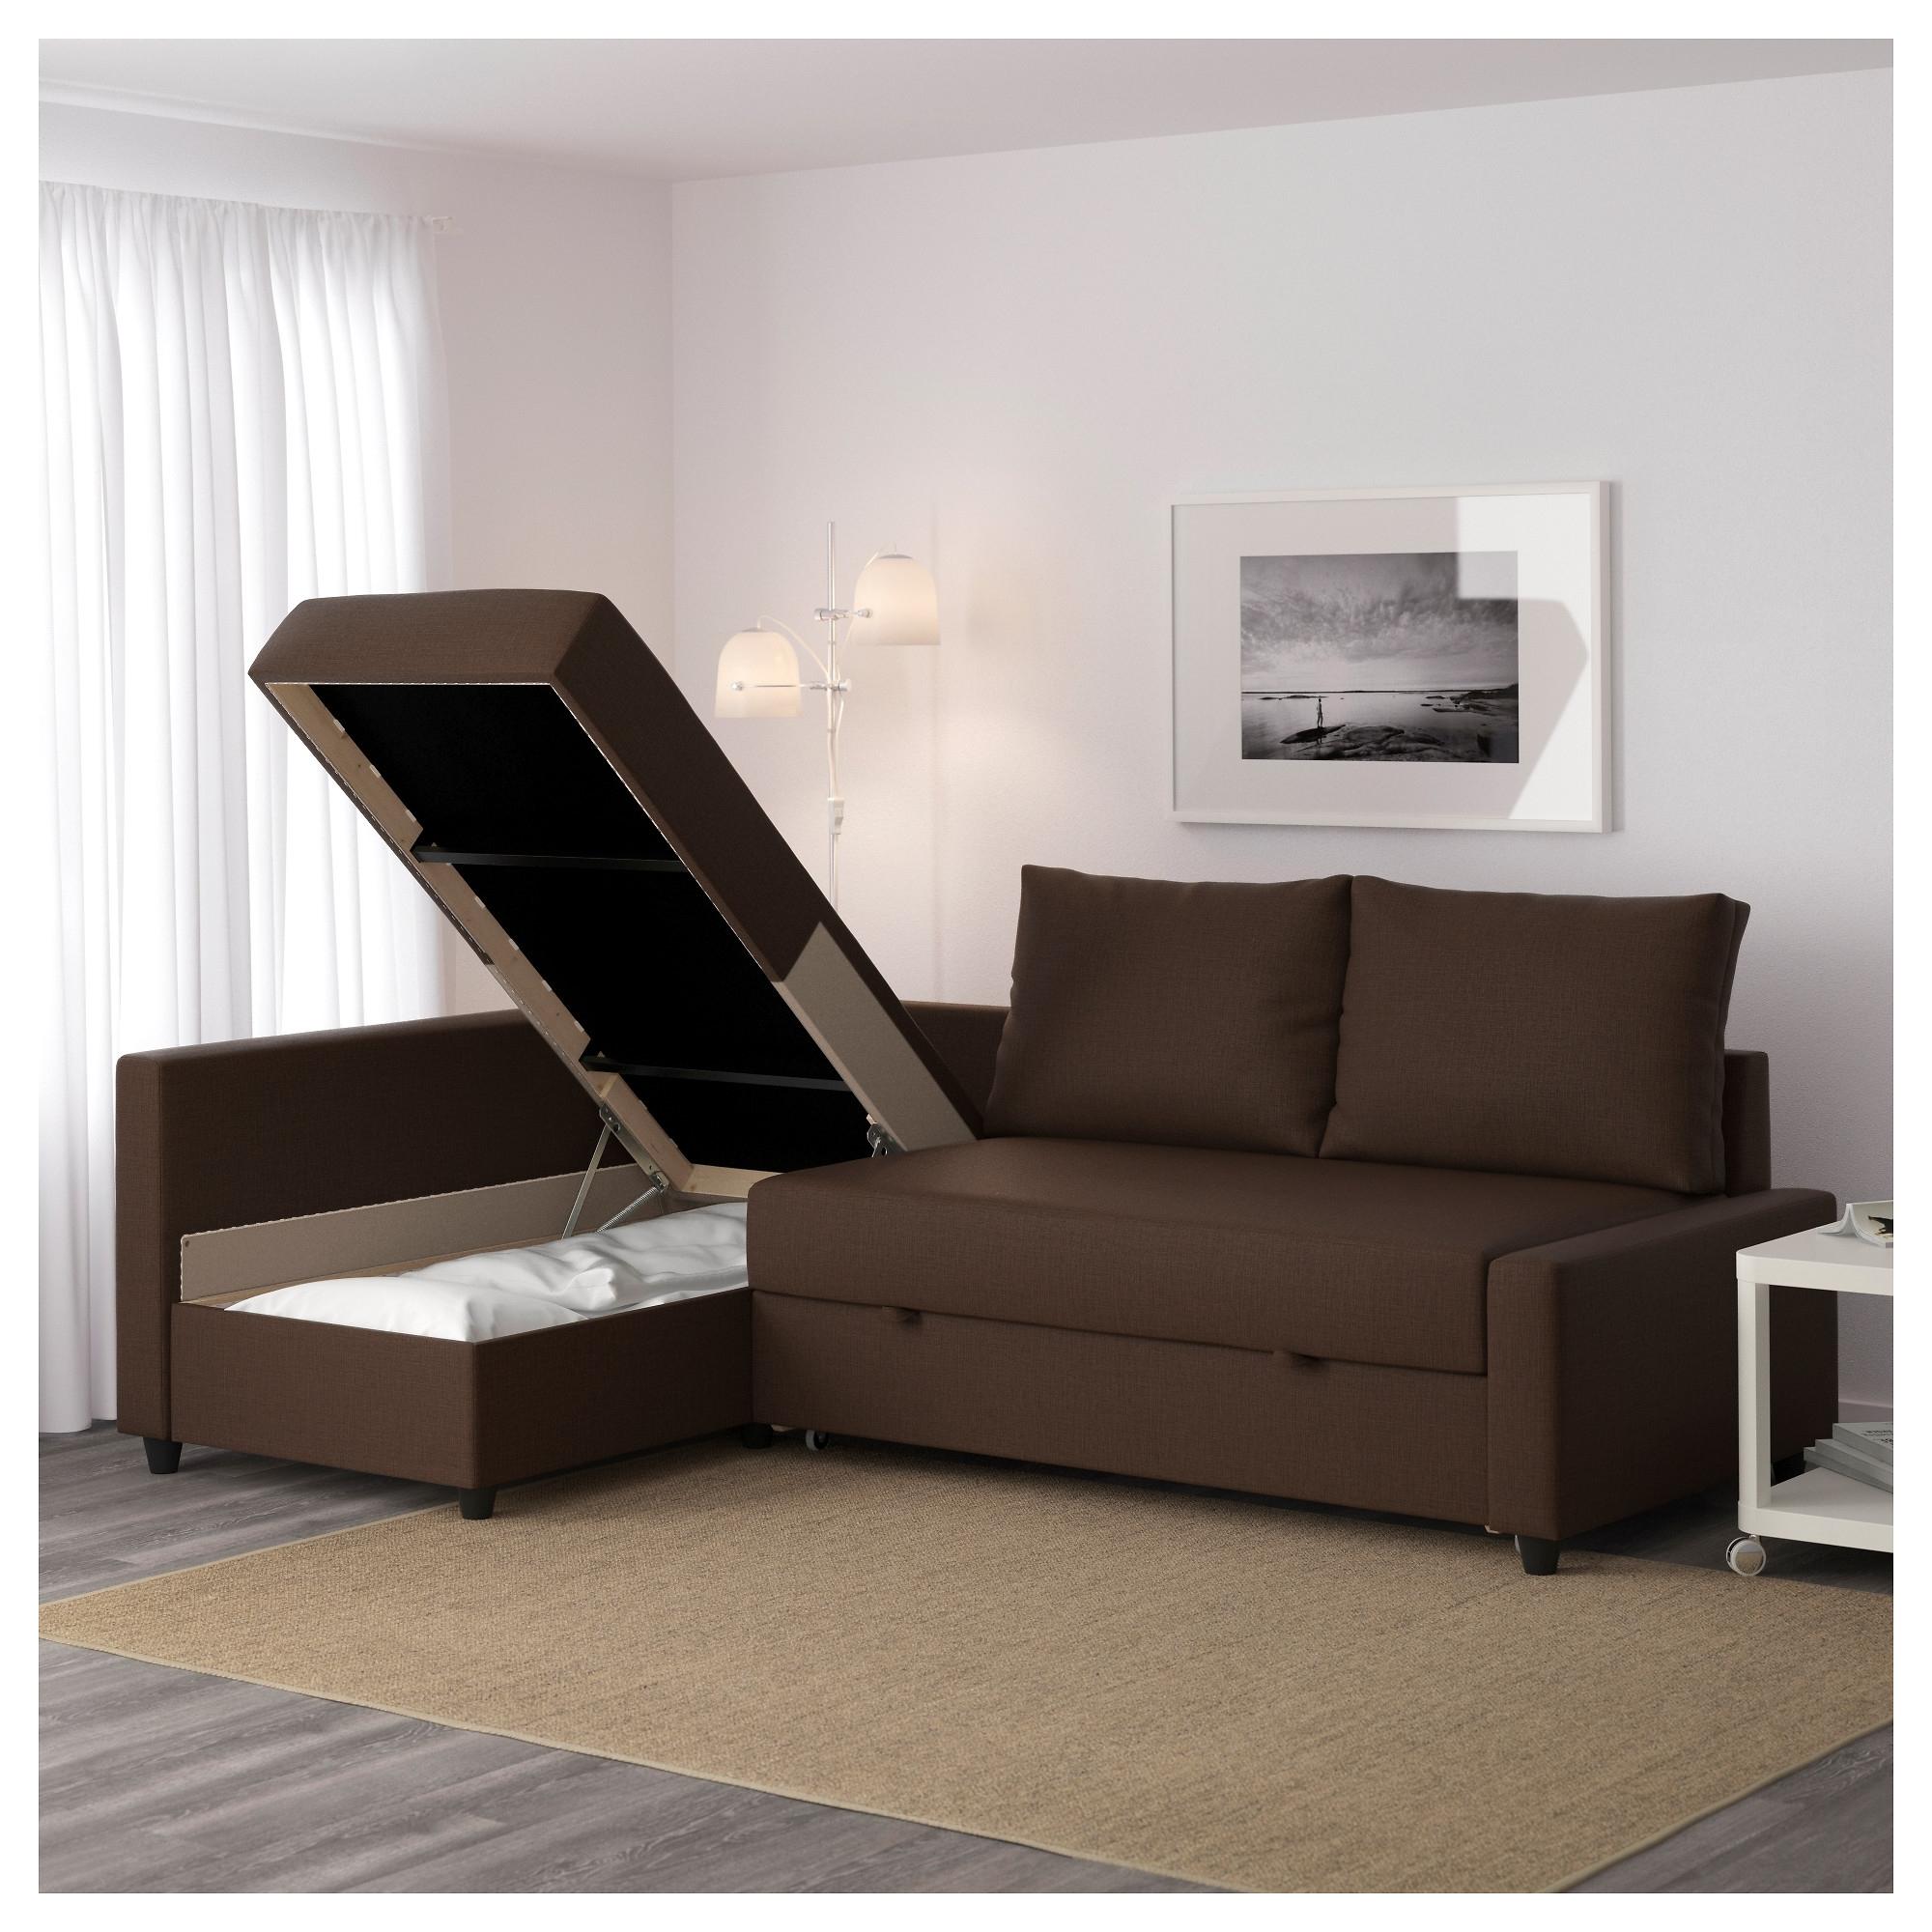 Friheten Corner Sofa Bed With Storage Skiftebo Brown – Ikea With Regard To Storage Sofas (Image 6 of 10)